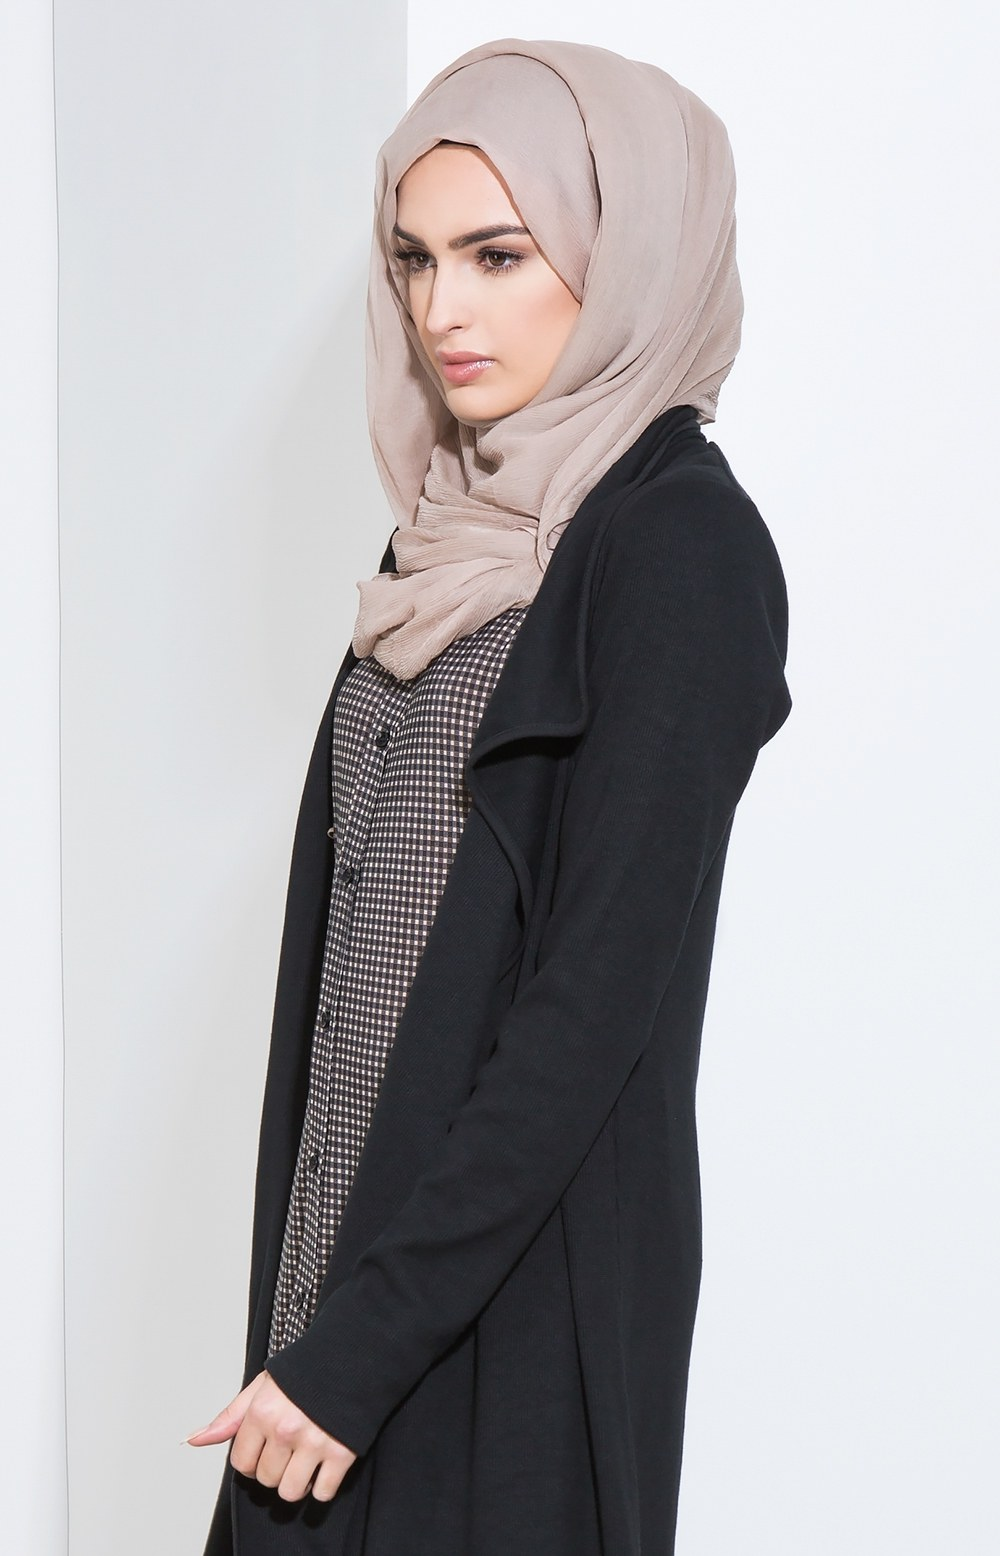 Bentuk Baju Lebaran 2016 Tldn 25 Trend Model Baju Muslim Lebaran 2018 Simple & Modis